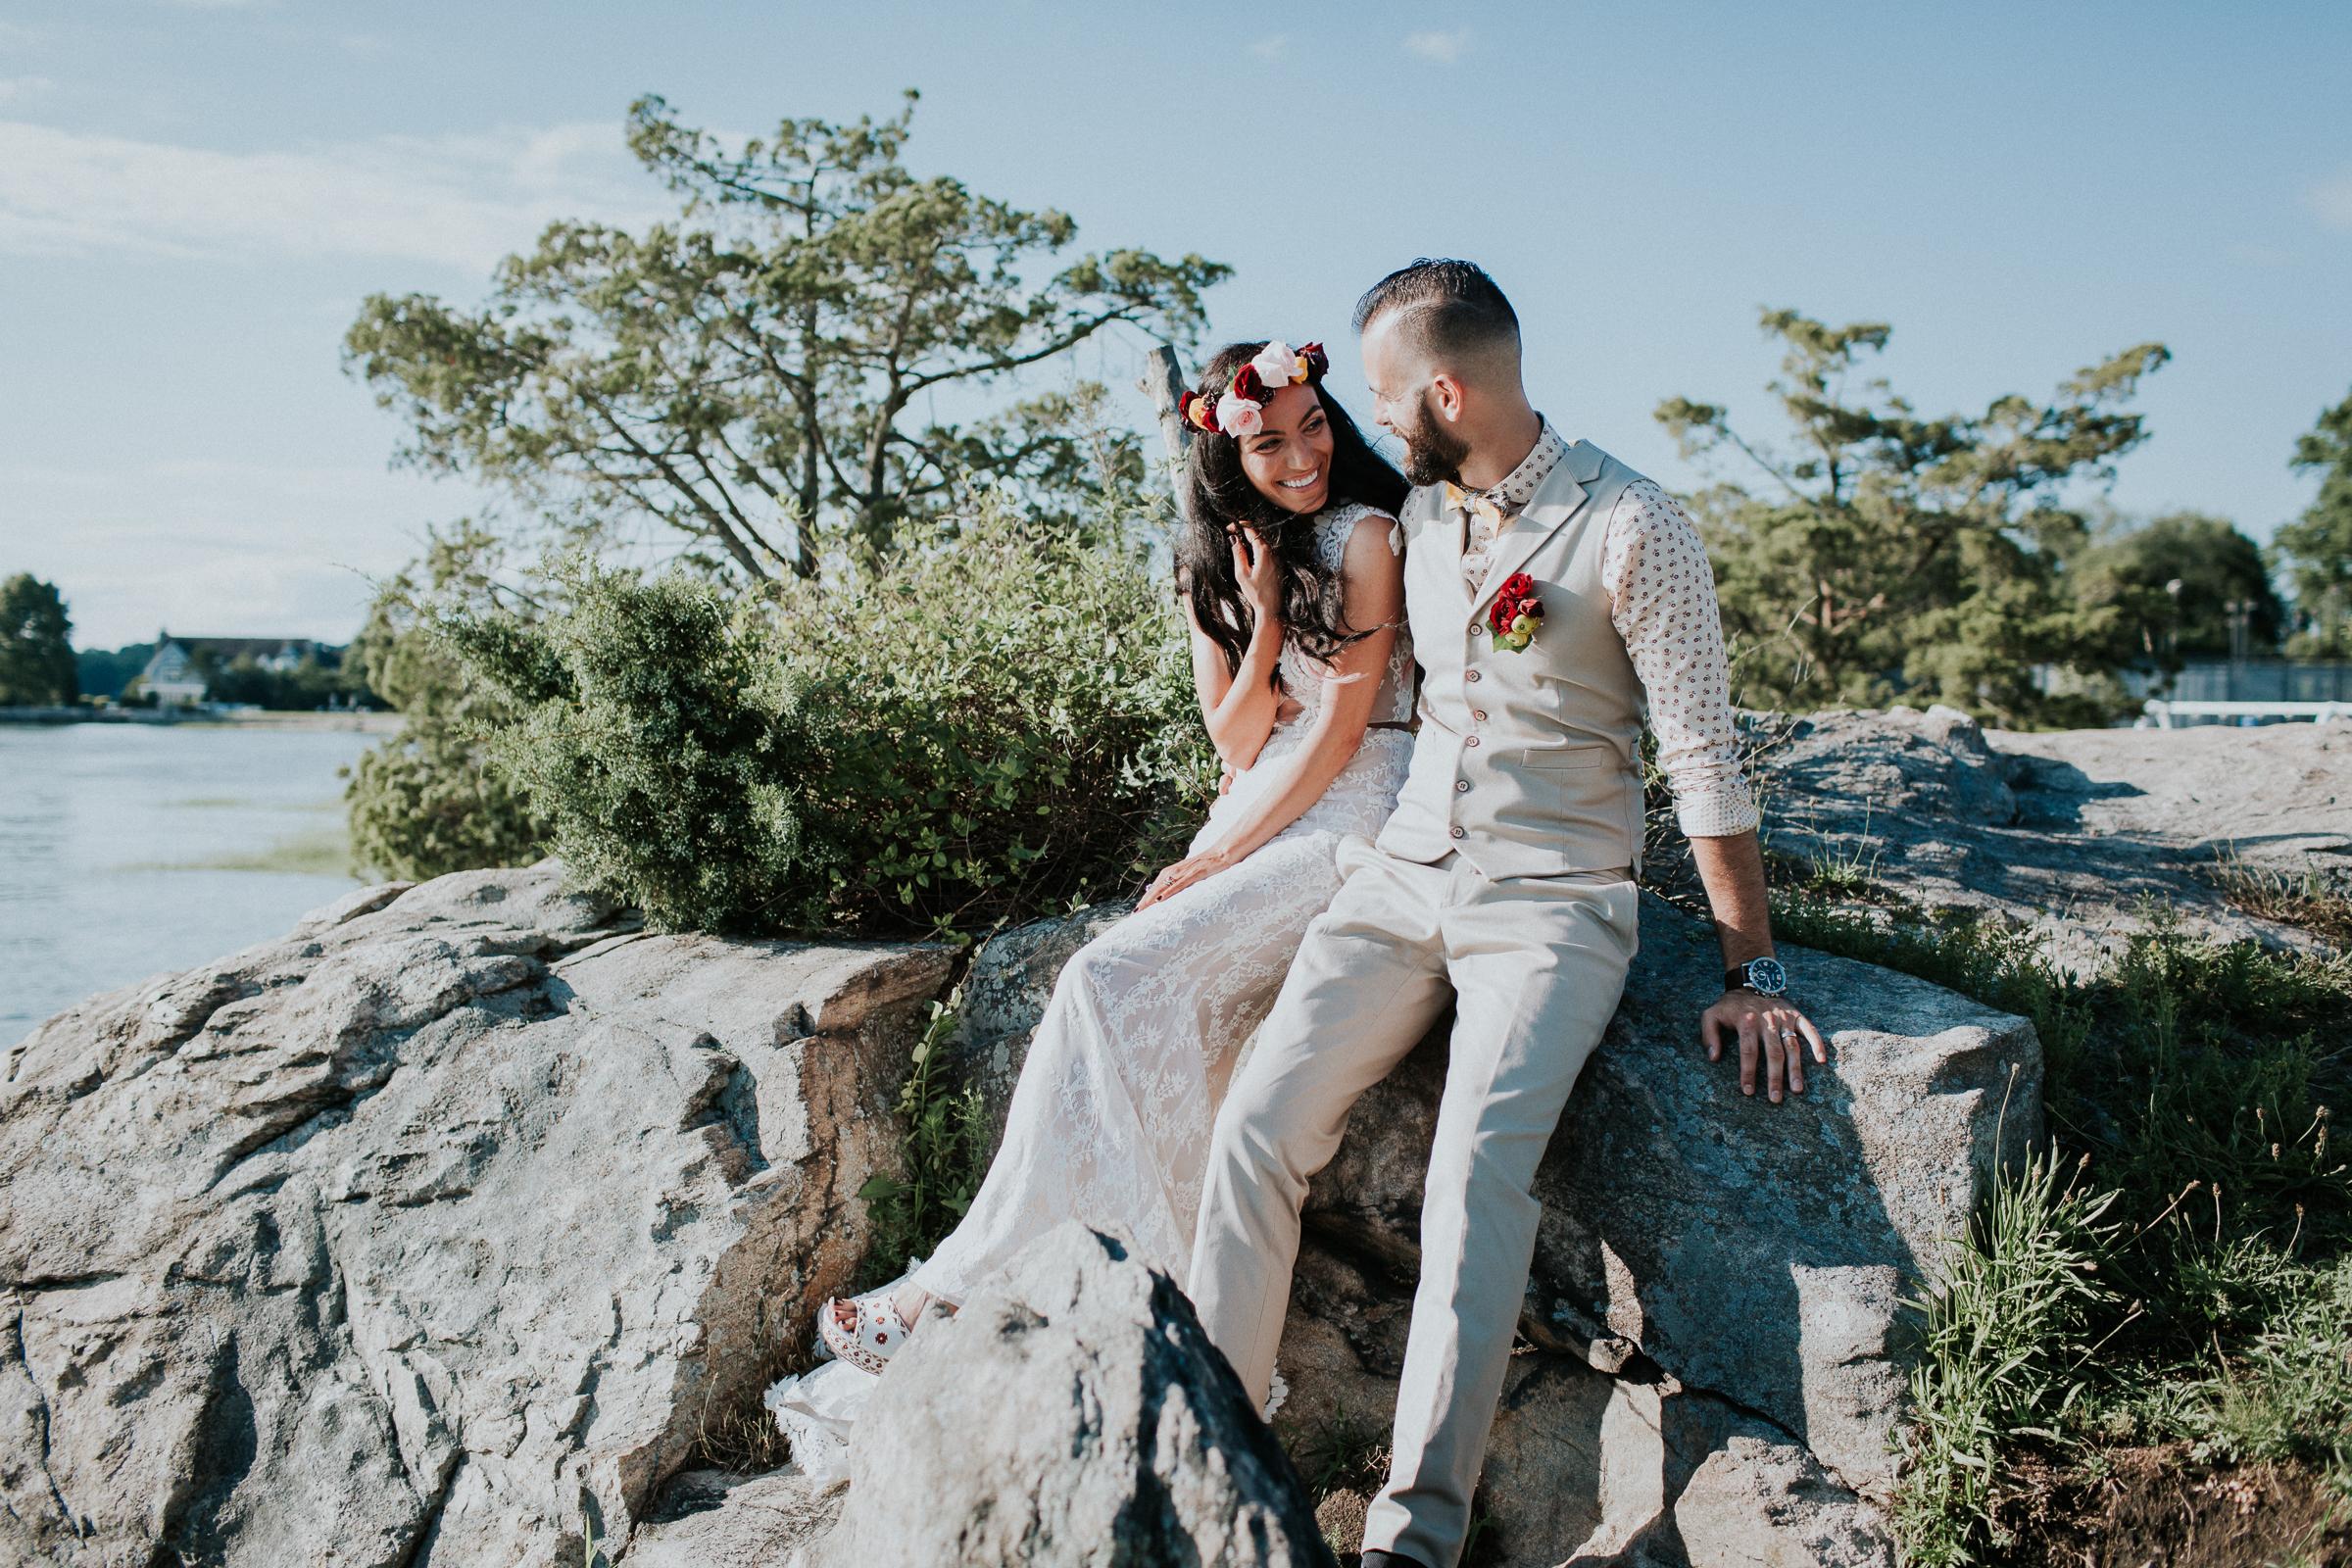 Backyard-Intimate-Adventurous-Destination-Wedding-Darien-Connecticut-Documentary-Wedding-Photography-80.jpg